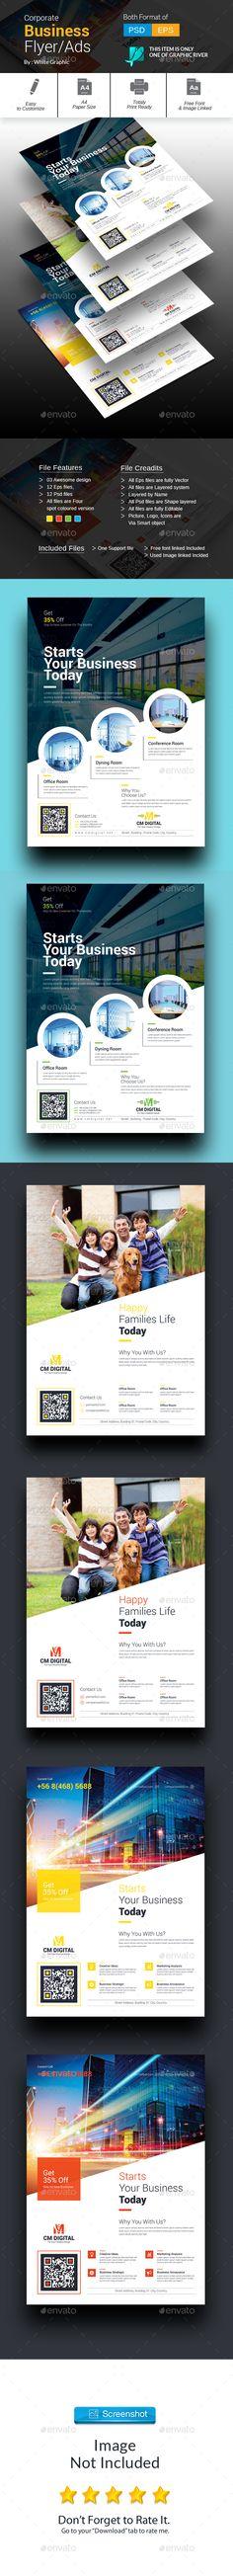 Corporate Flyer Template PSD #design Download: http://graphicriver.net/item/corporate-flyer/13652844?ref=ksioks